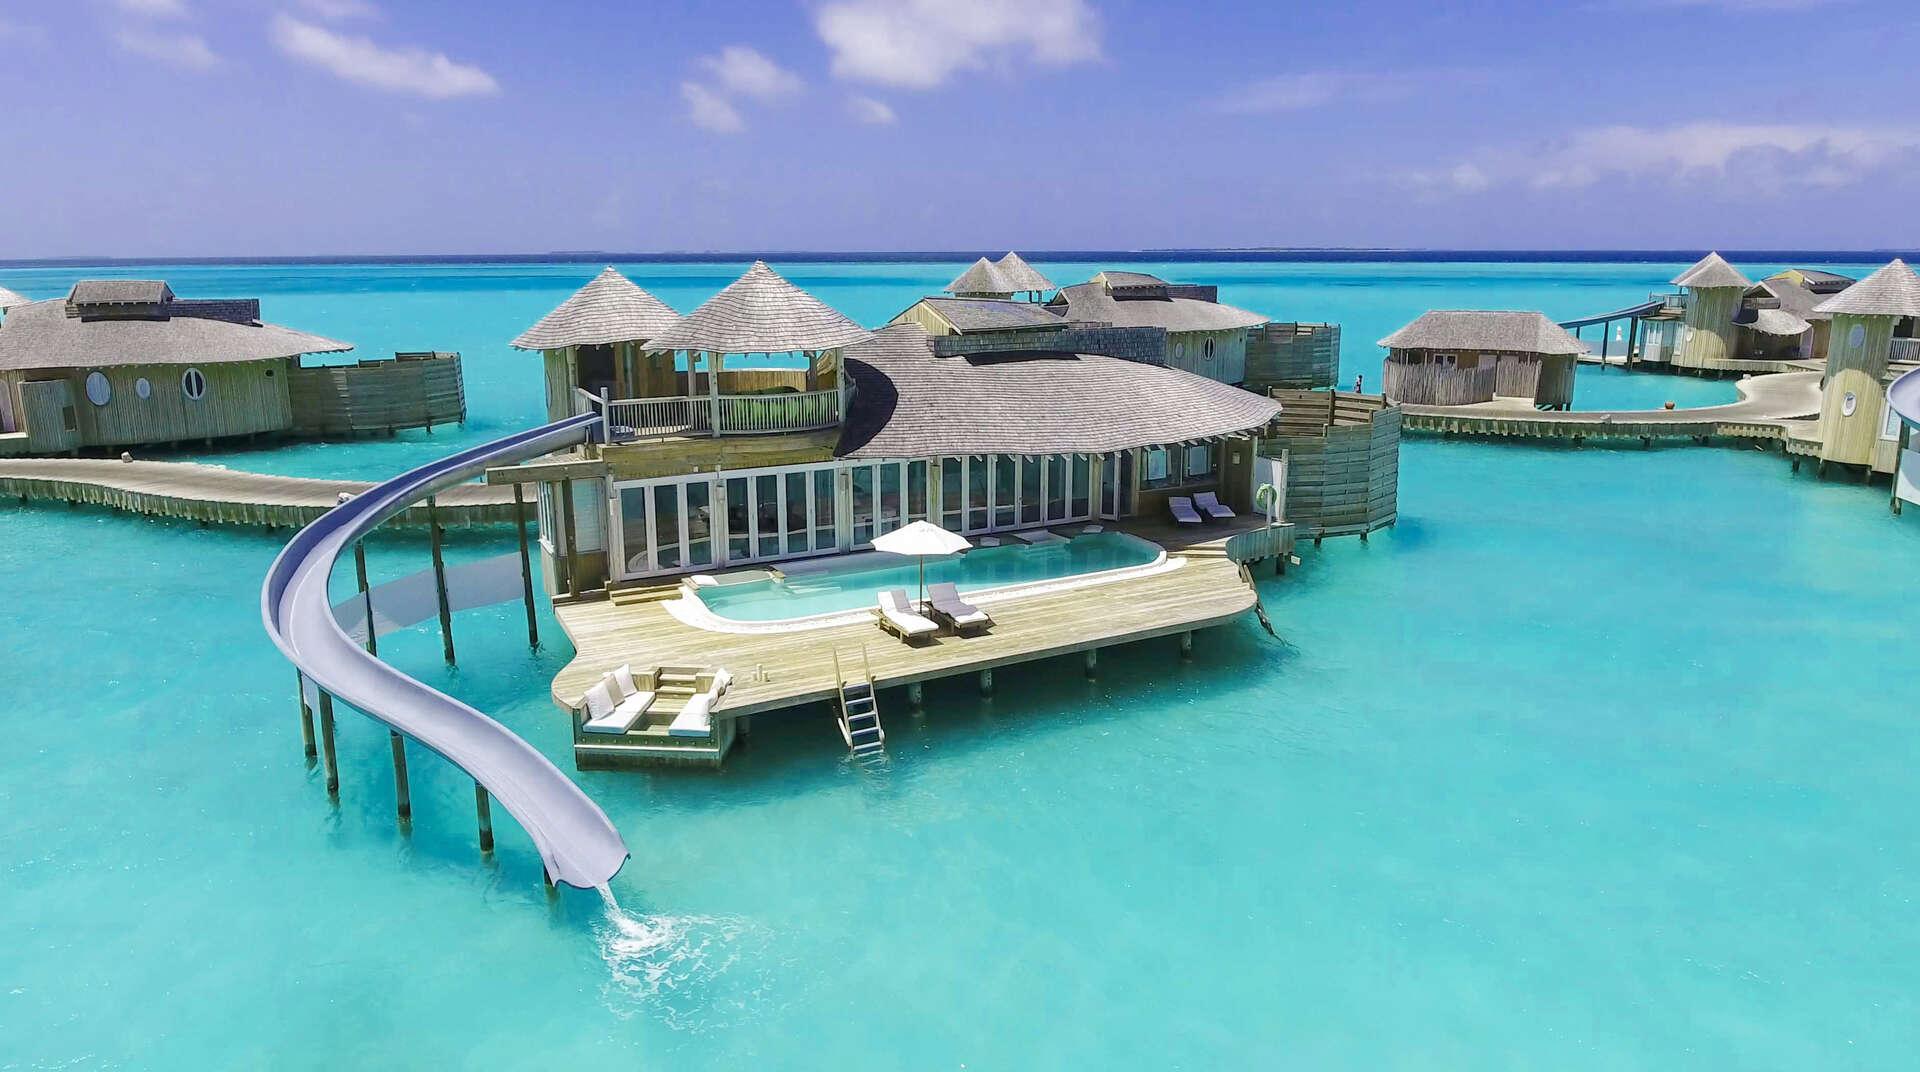 Luxury villa rentals asia - Maldives - Medhufaru island - Soneva jani resort - 1 BDM Water Retreat with Slide - Image 1/34